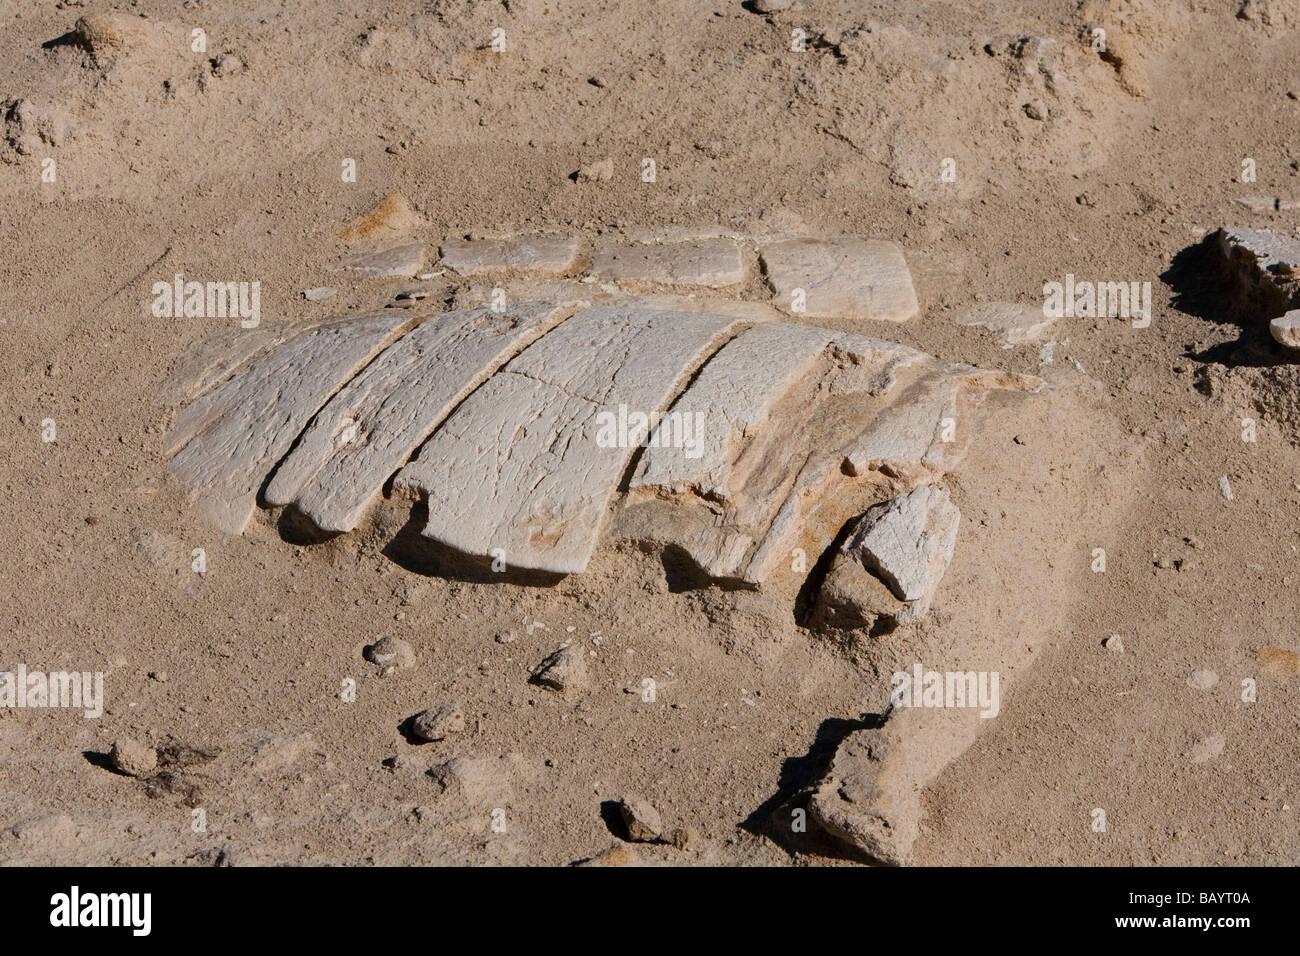 Fossiler Schildkrötenpanzer marine turtle skeleton fossil Punto Colorado Baja California Mexico - Stock Image